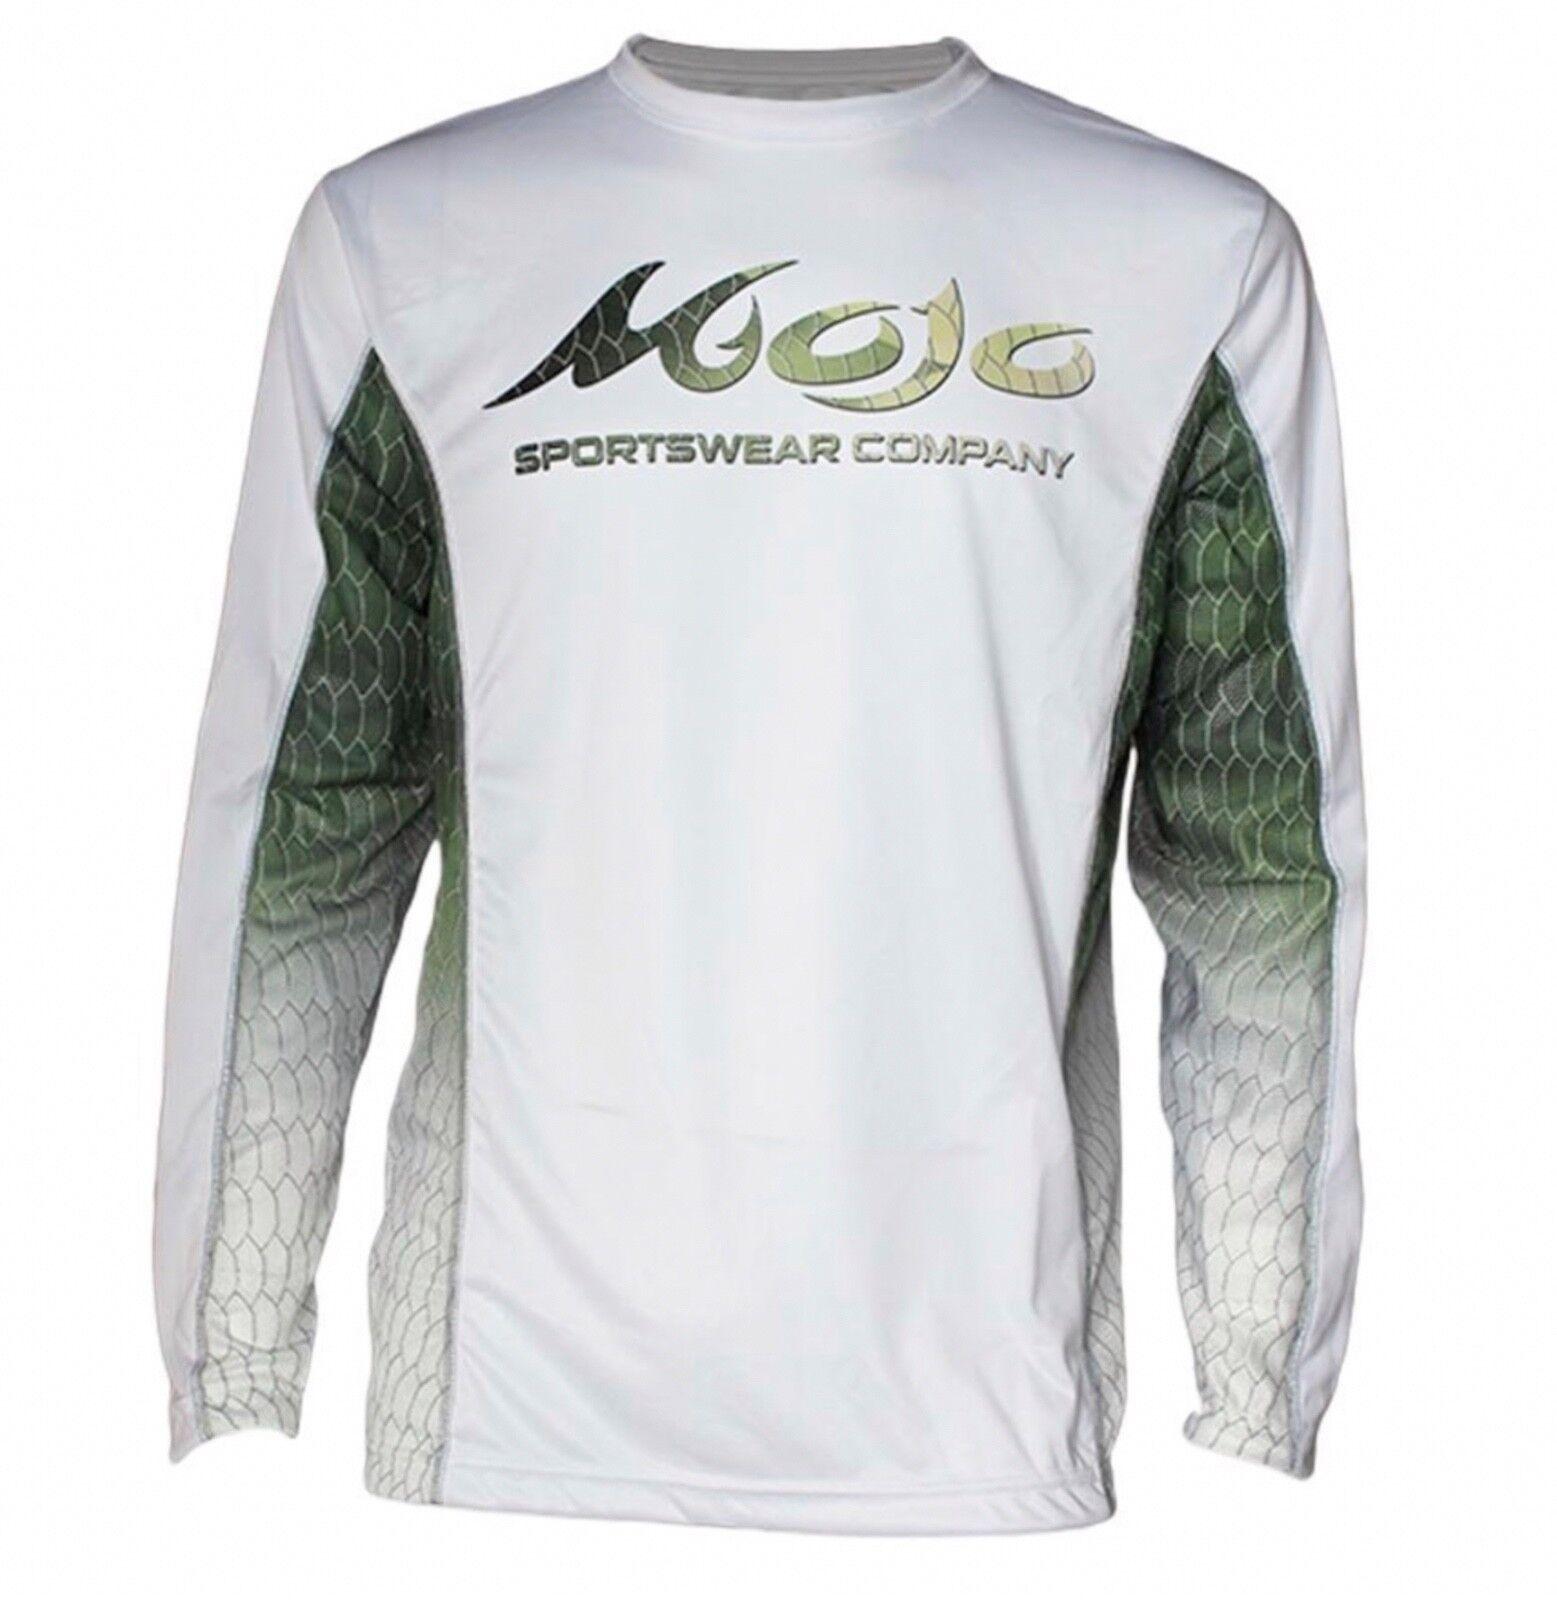 Mojo Sportswear Finny Vented Performance Fishing Boat T-shirt..XS-3X..Tarpon